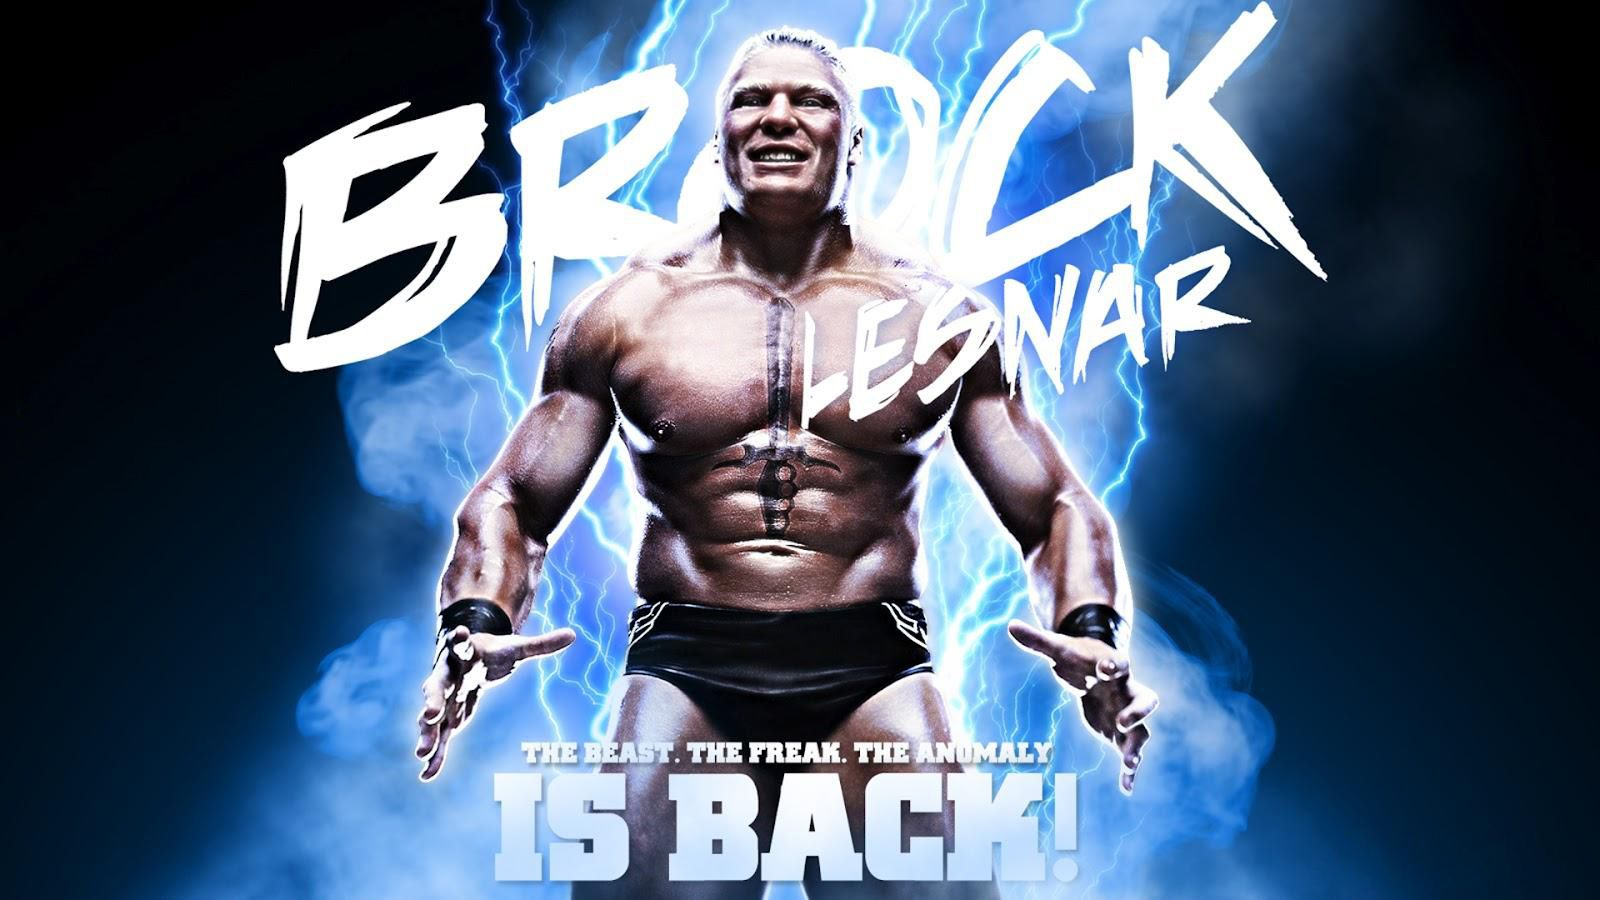 Brock Lesnar Hd Wallpaper Pictures Brock Lesnar Wwe Pictures Wwe Wallpapers